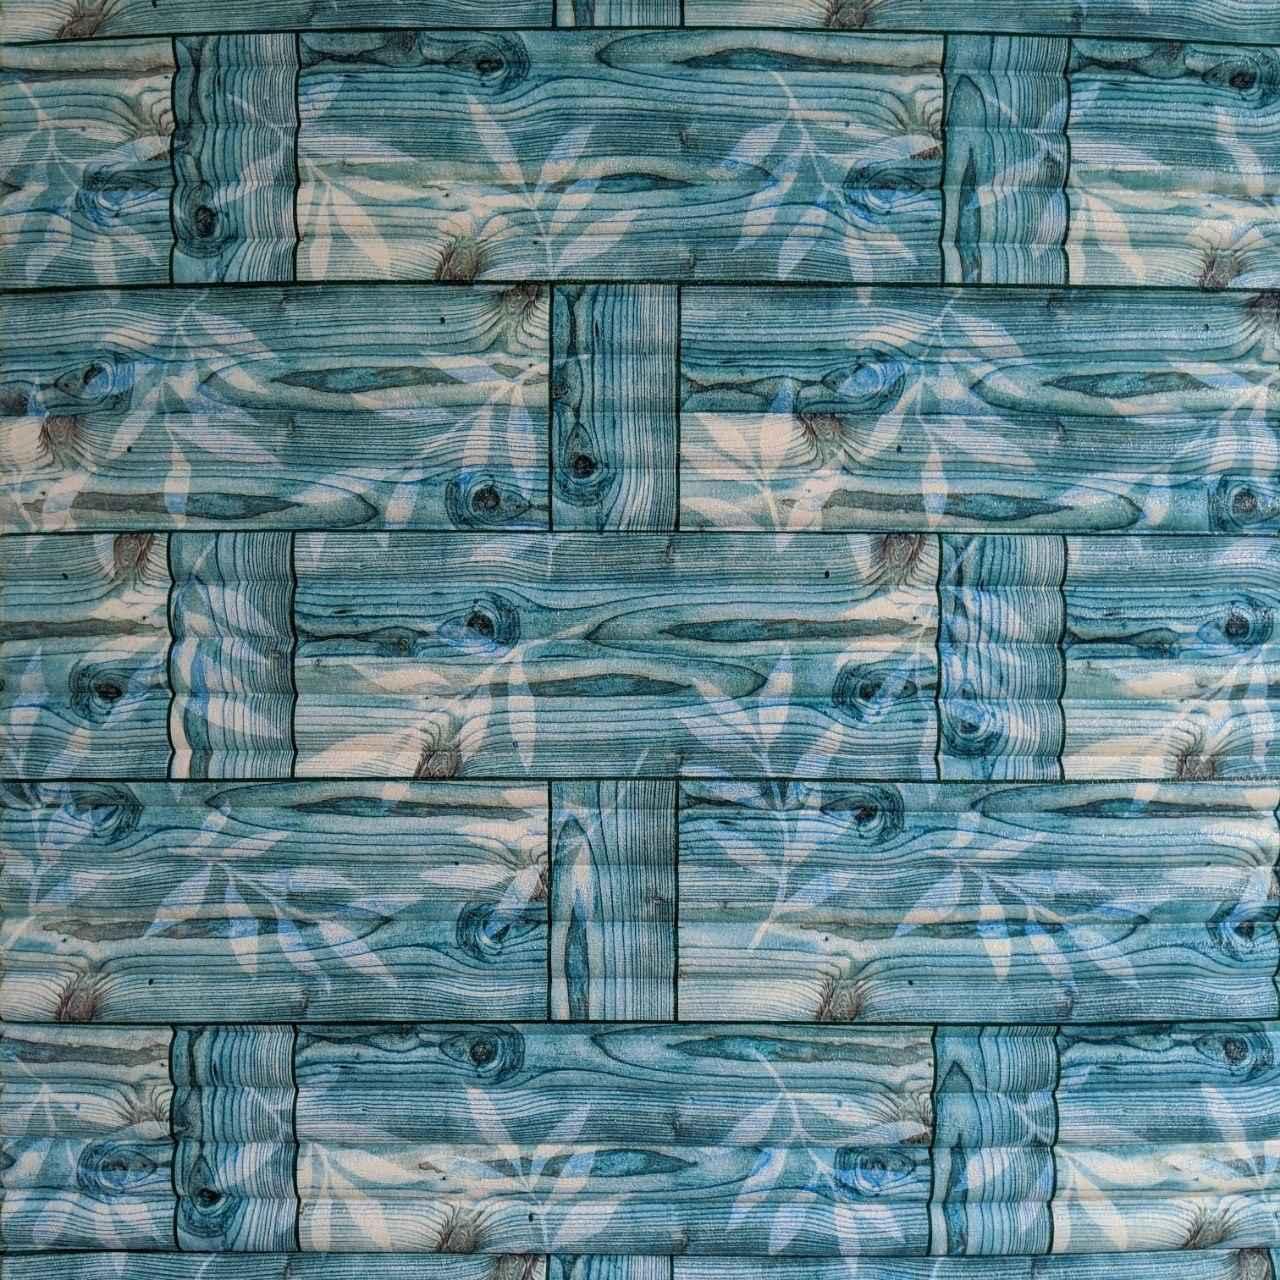 Самоклеящаяся декоративная 3D панель бамбук кладка бирюза 700x700x9 мм (самоклейка, Мягкие 3D Панели)